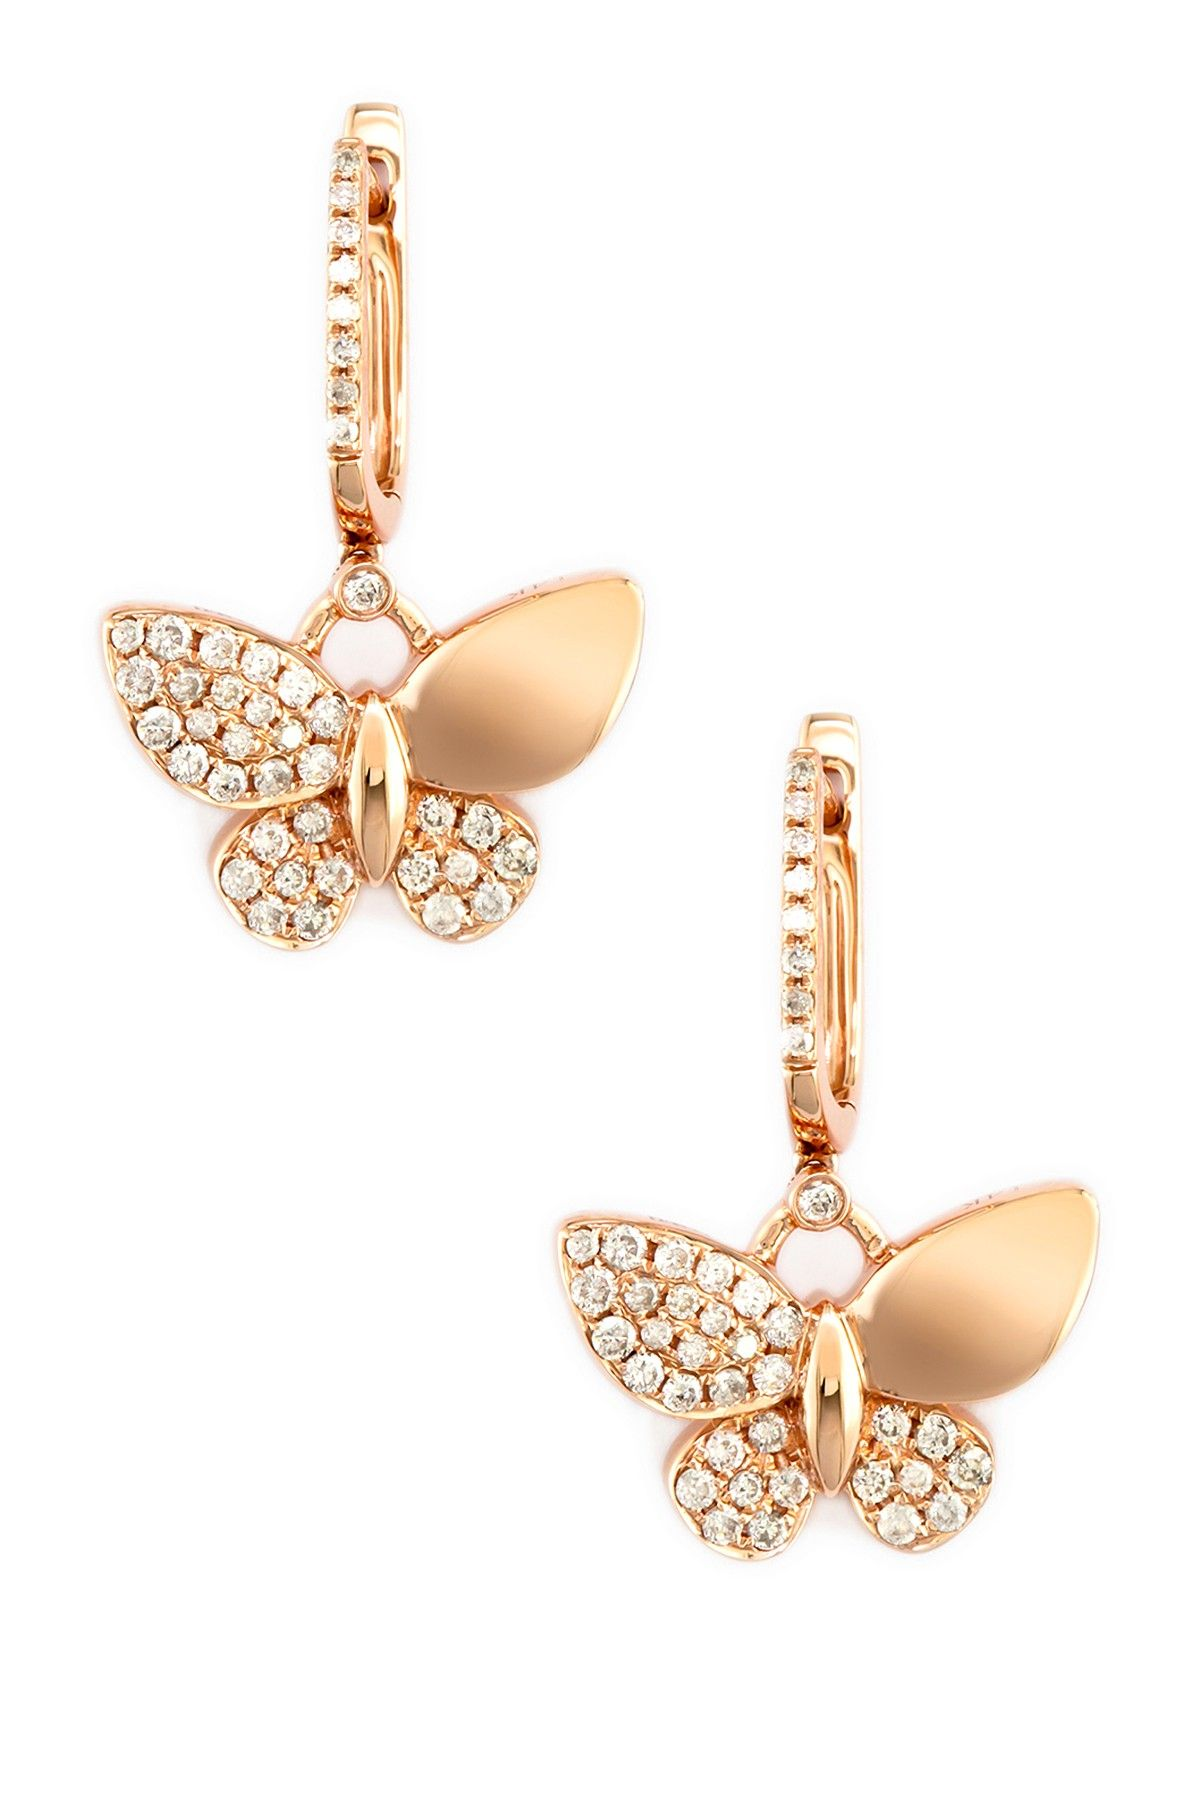 14K Gold Diamond Studs 14K Gold Diamond Flower Studs 14K Gold Floral Stud Earring Gold Party Wear Women Studs 14K Gold Stud Earrings,